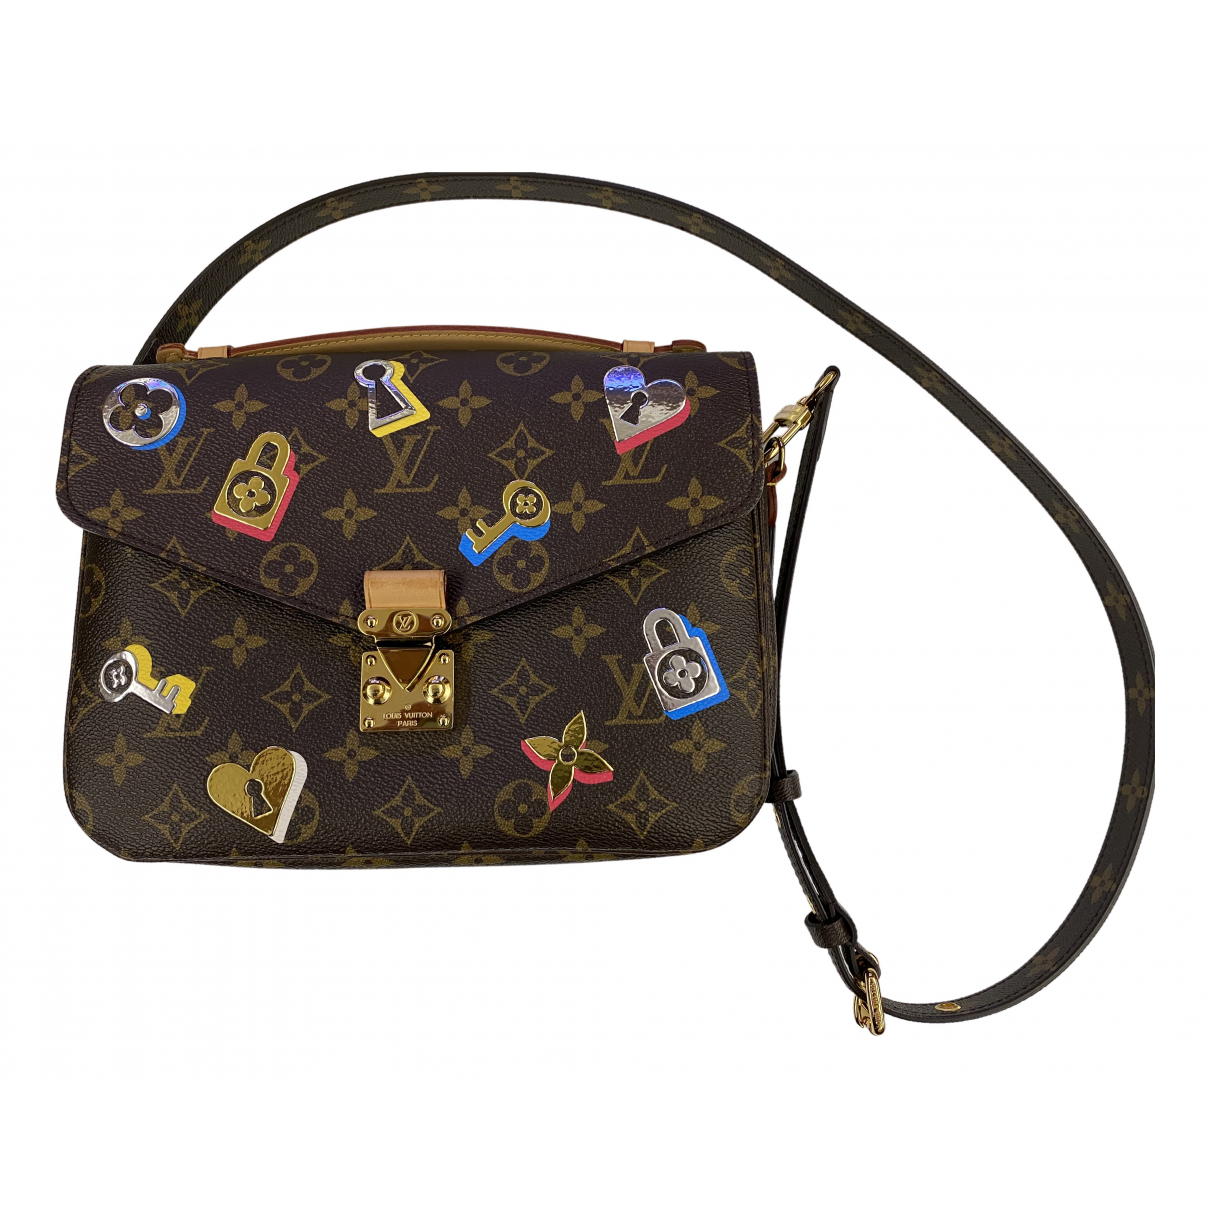 Louis Vuitton Metis Cloth handbag for Women N